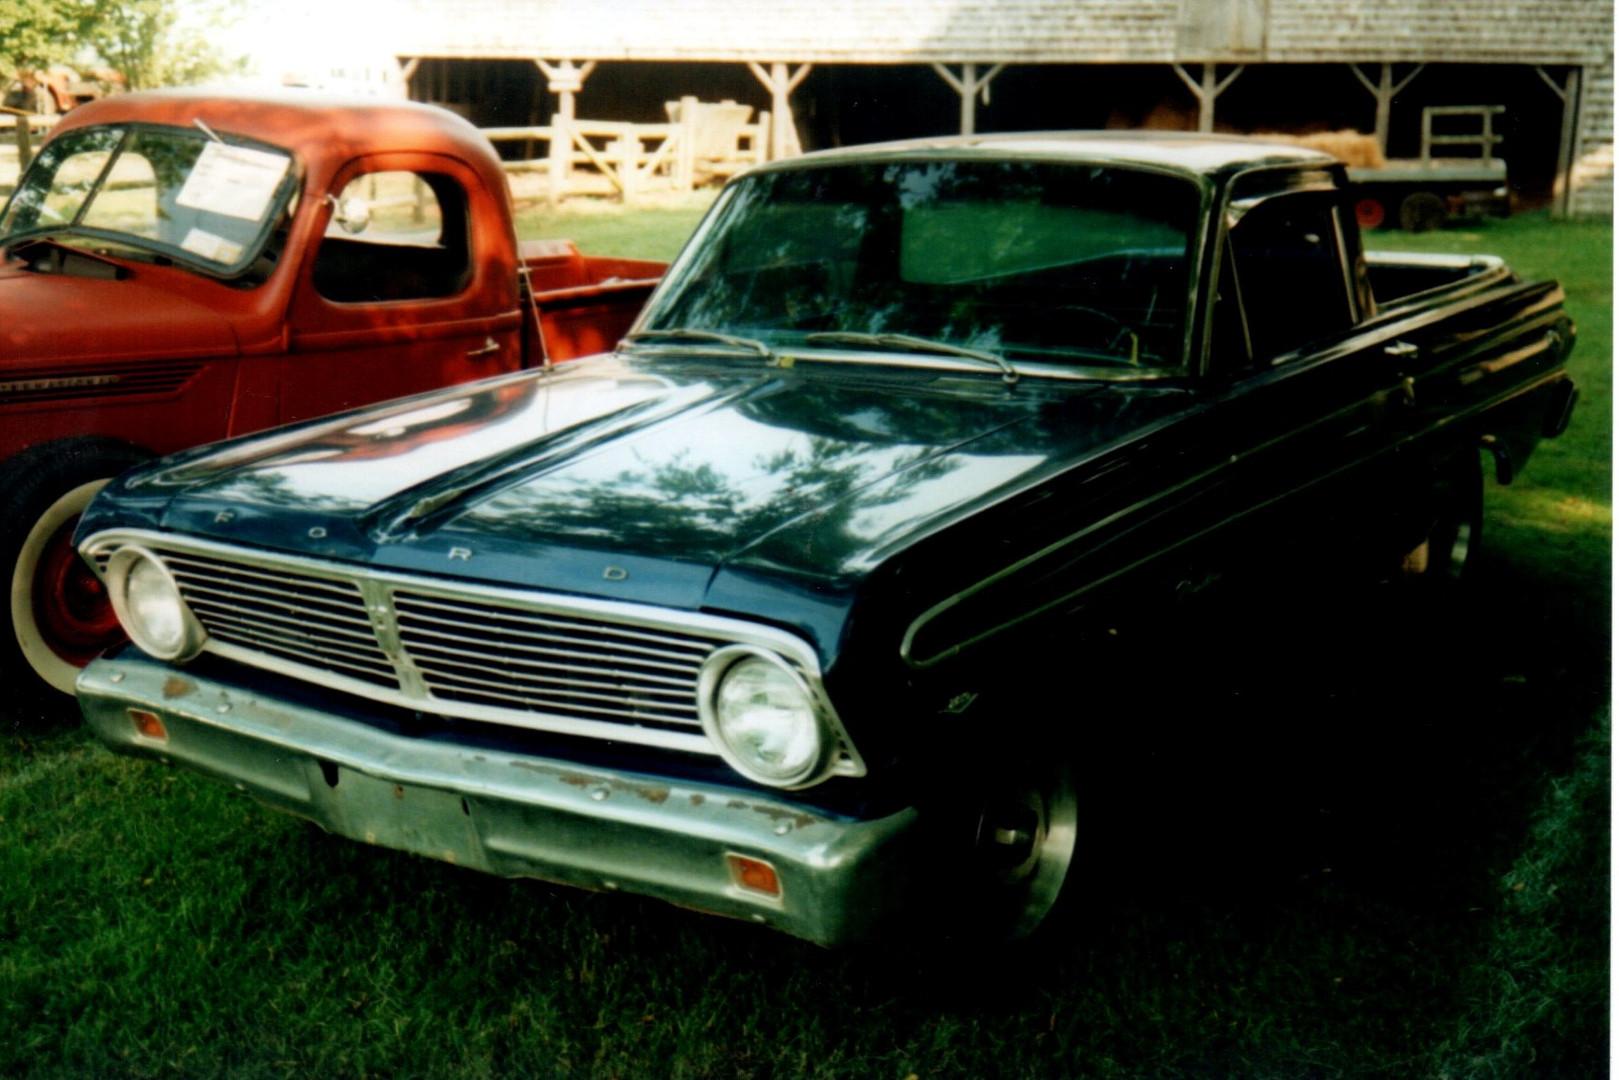 1965 Ford Falcon Ranchero - Bruce Young